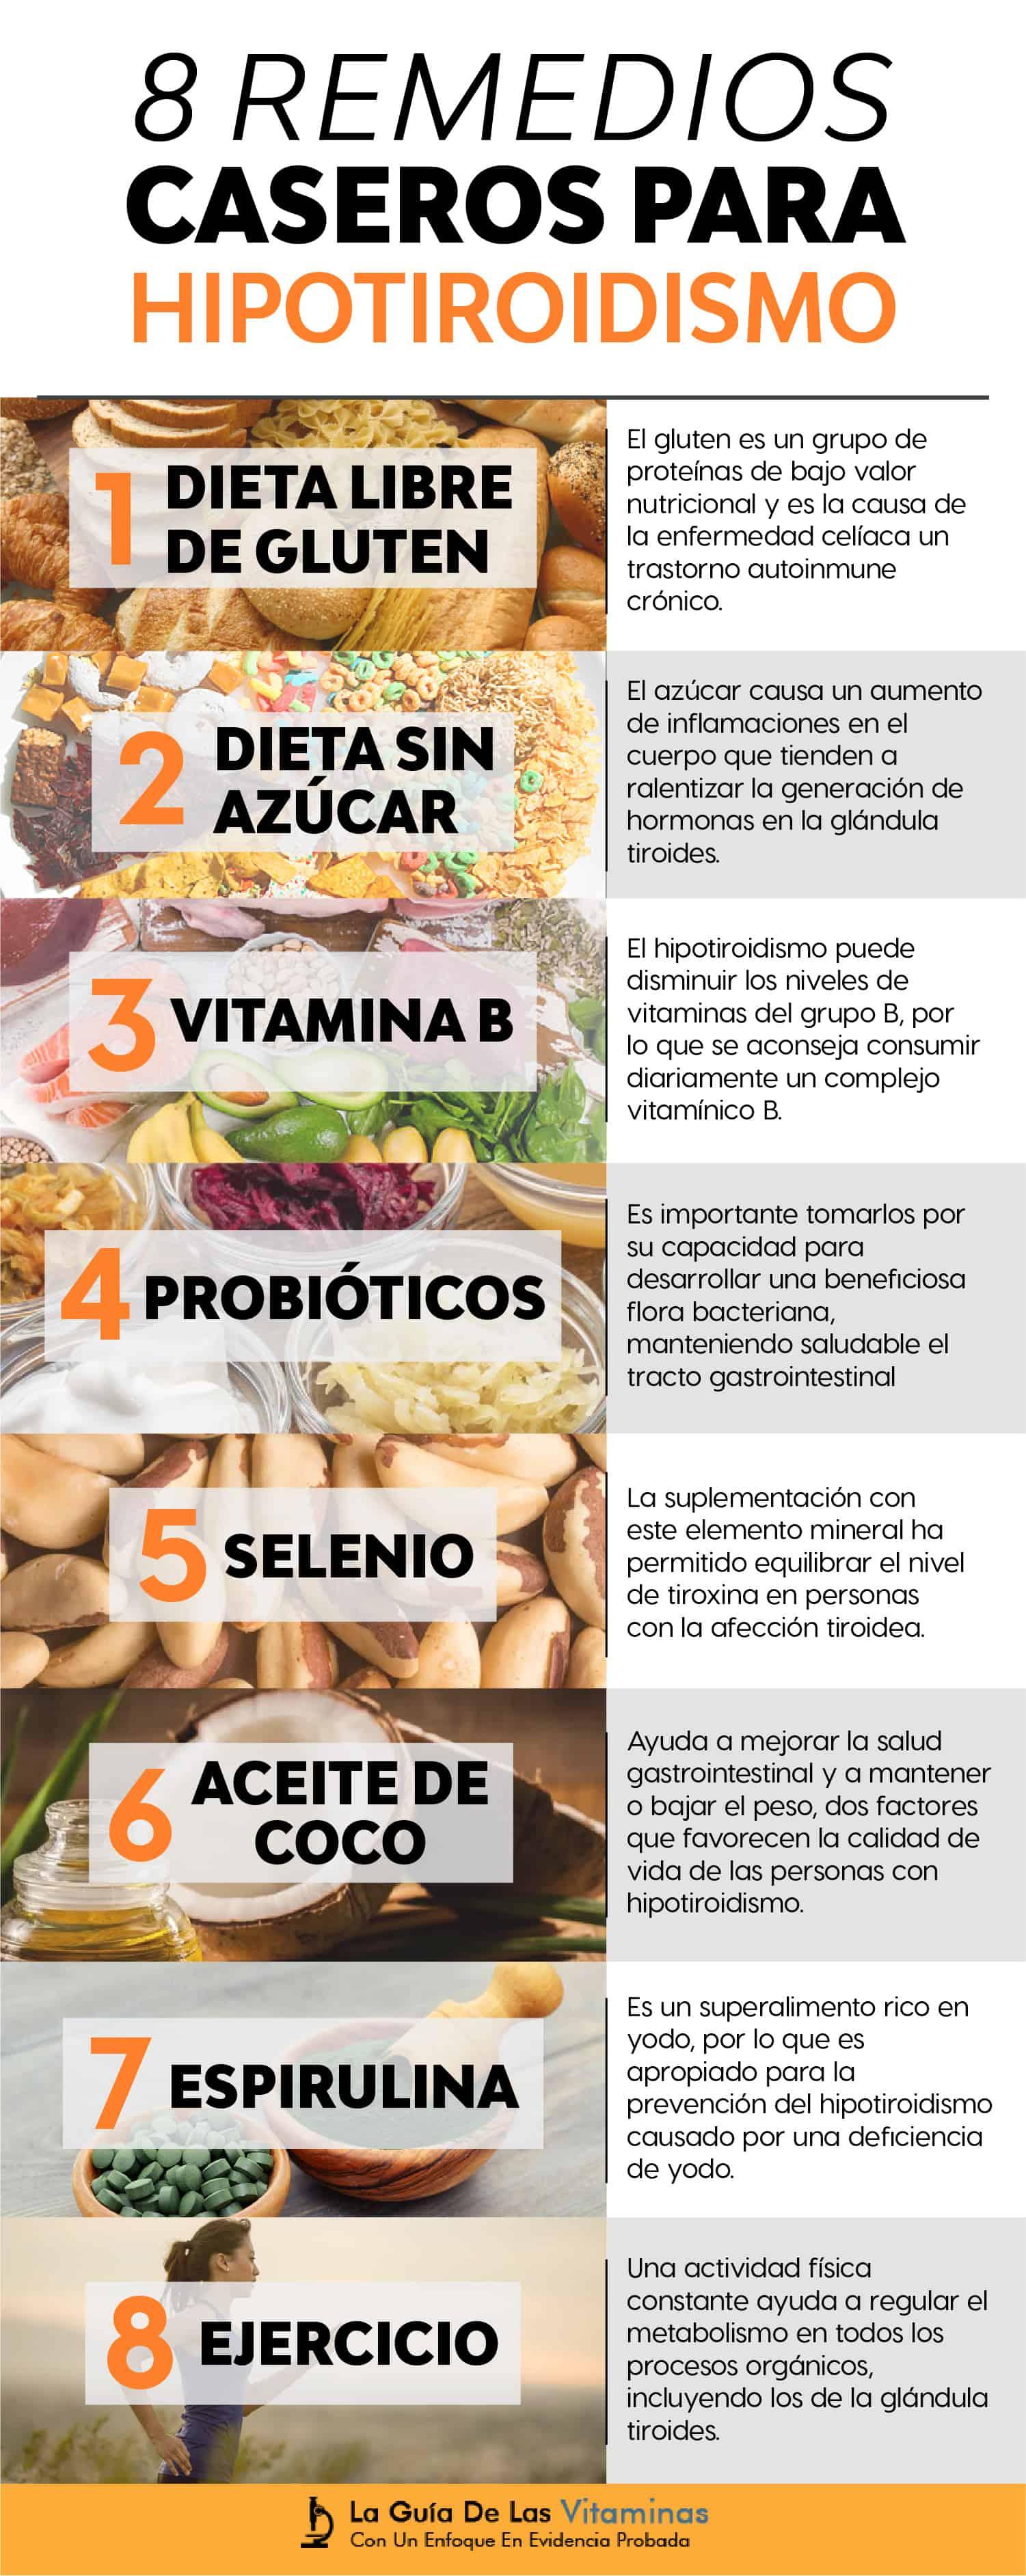 Dieta para perder peso para personas con hipotiroidismo